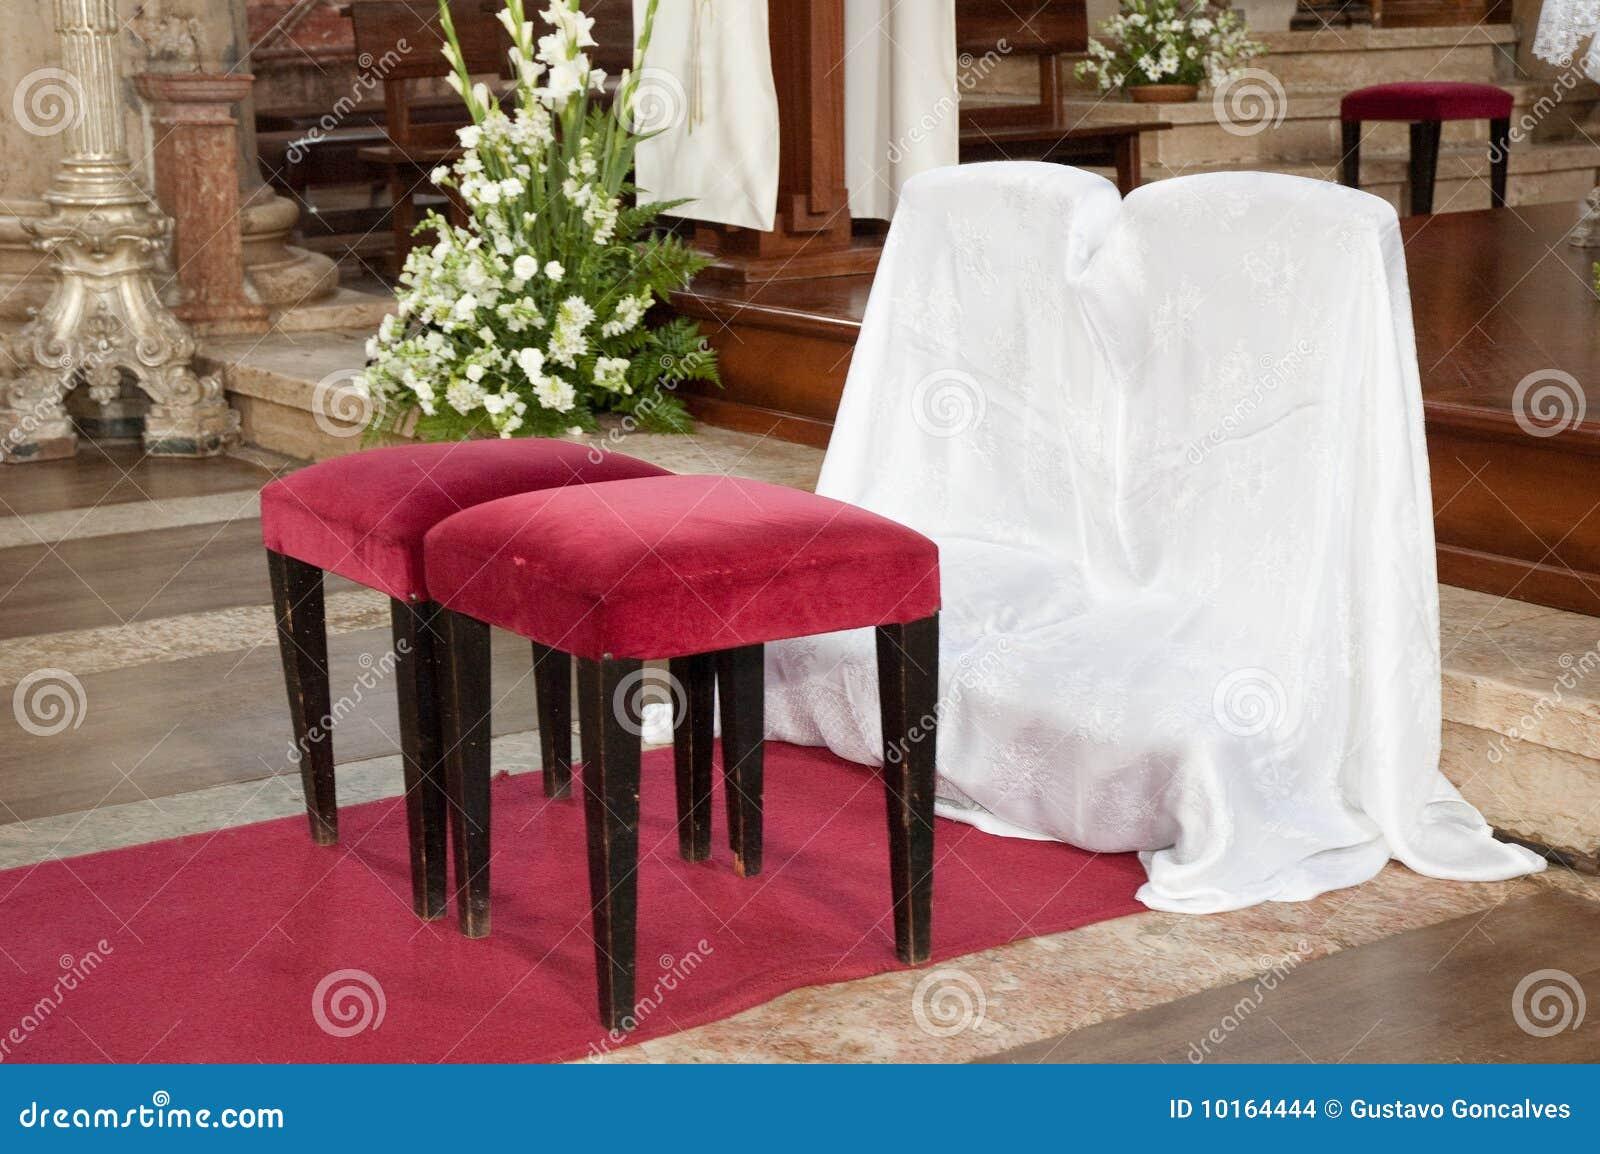 Iglesia del taburete de la boda imagenes de archivo for Sillas para iglesia en madera